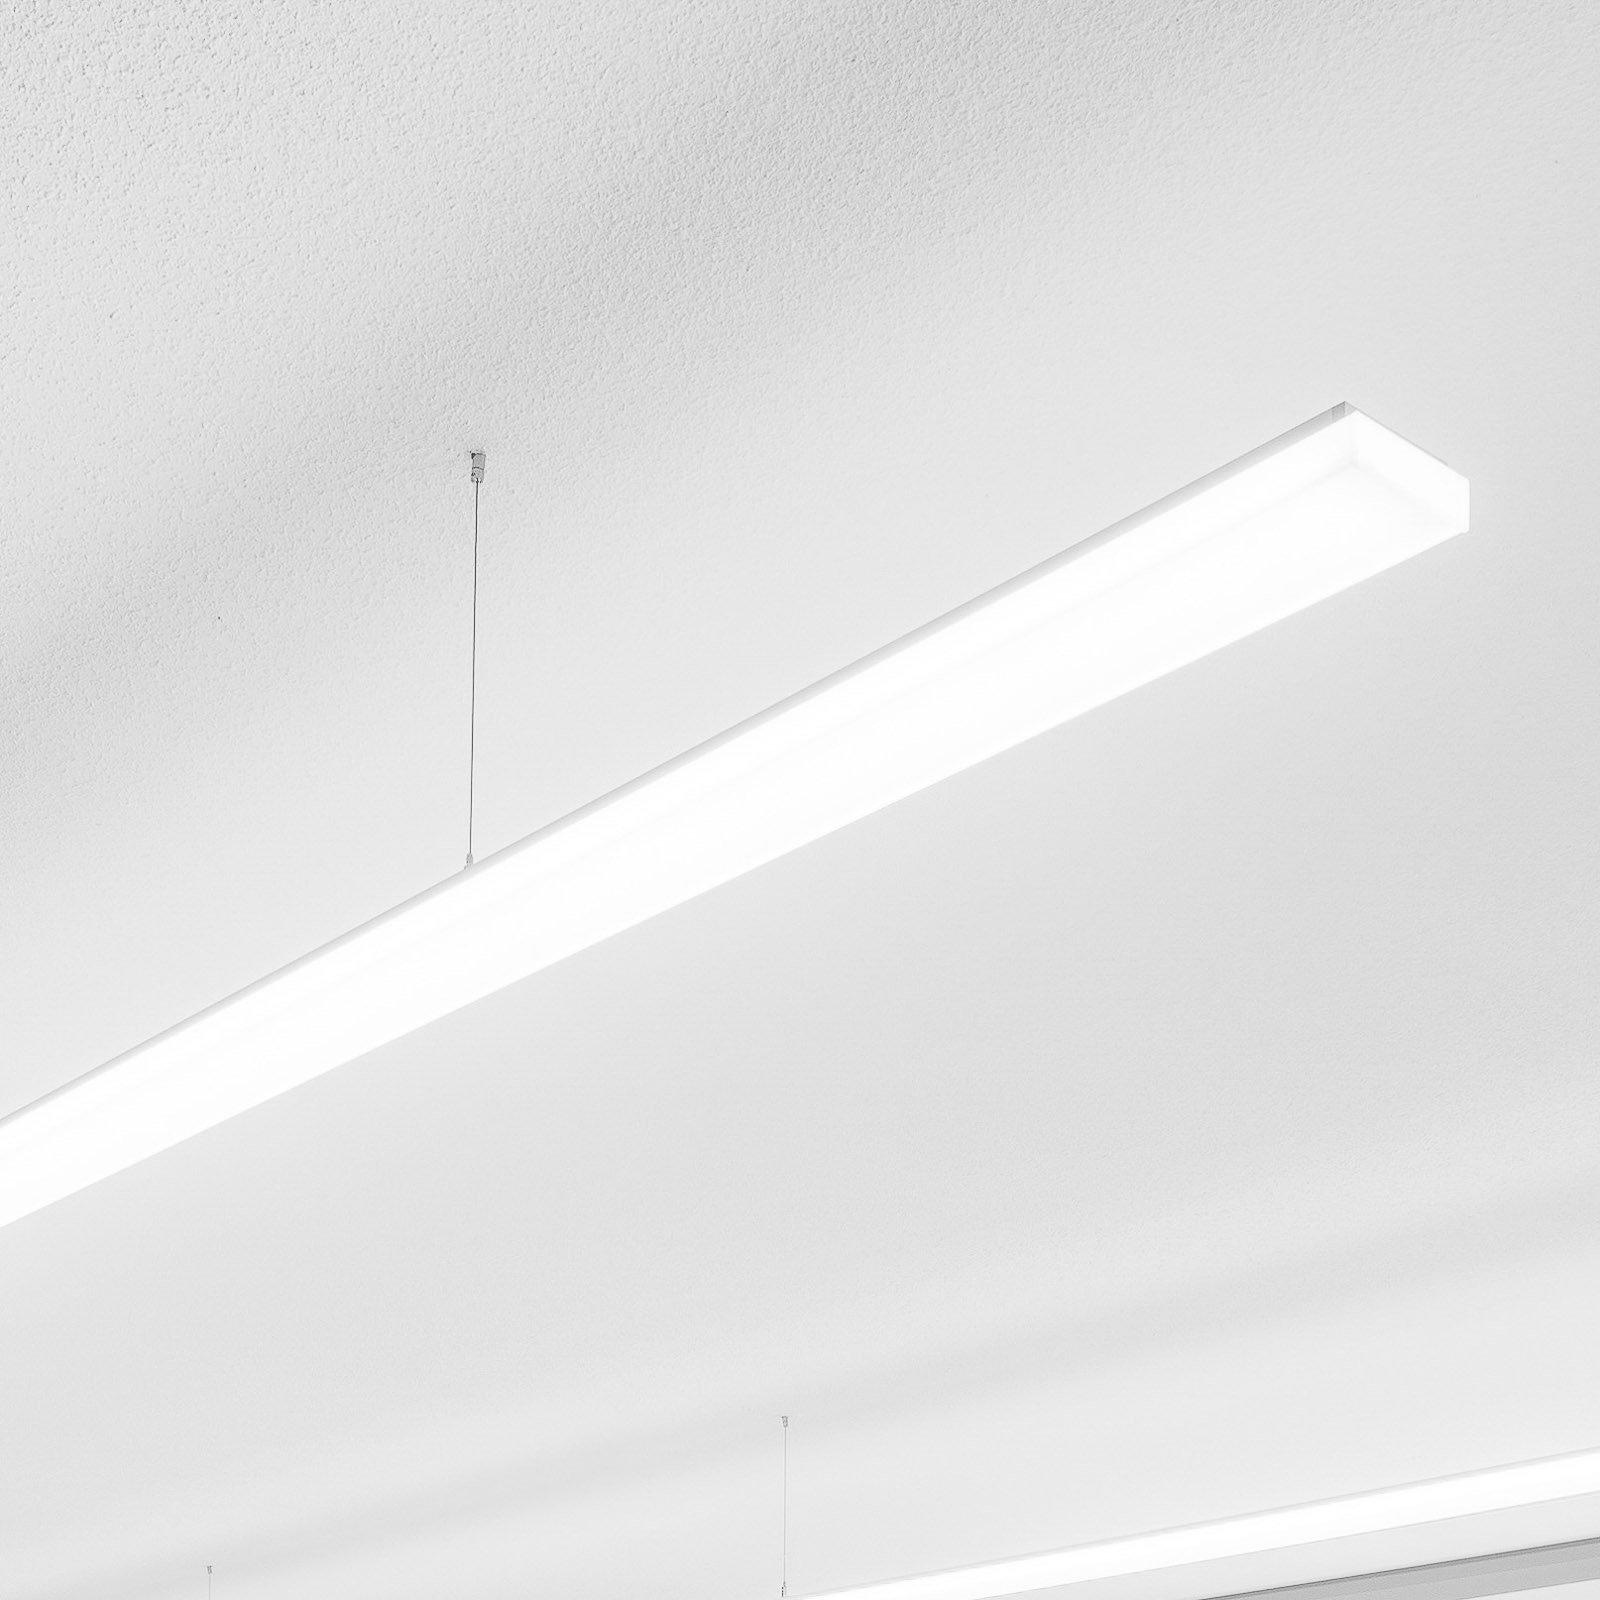 Regent Purelite Office taklampe 123,1 cm 3 000 K